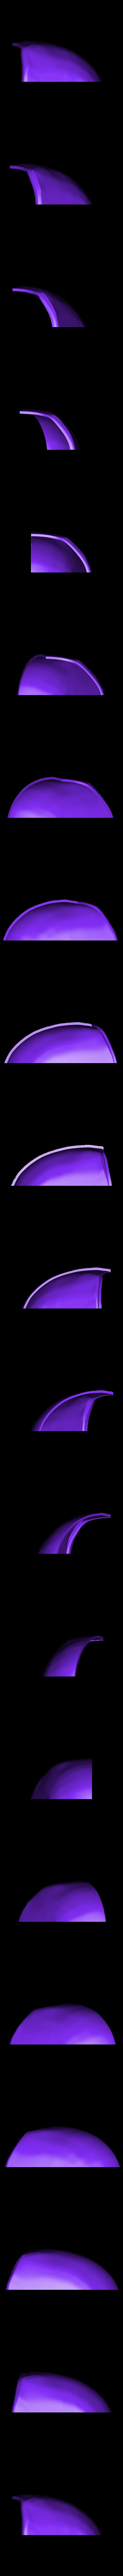 Part_1.stl Download free STL file Deathstroke Mask • 3D printable object, VillainousPropShop